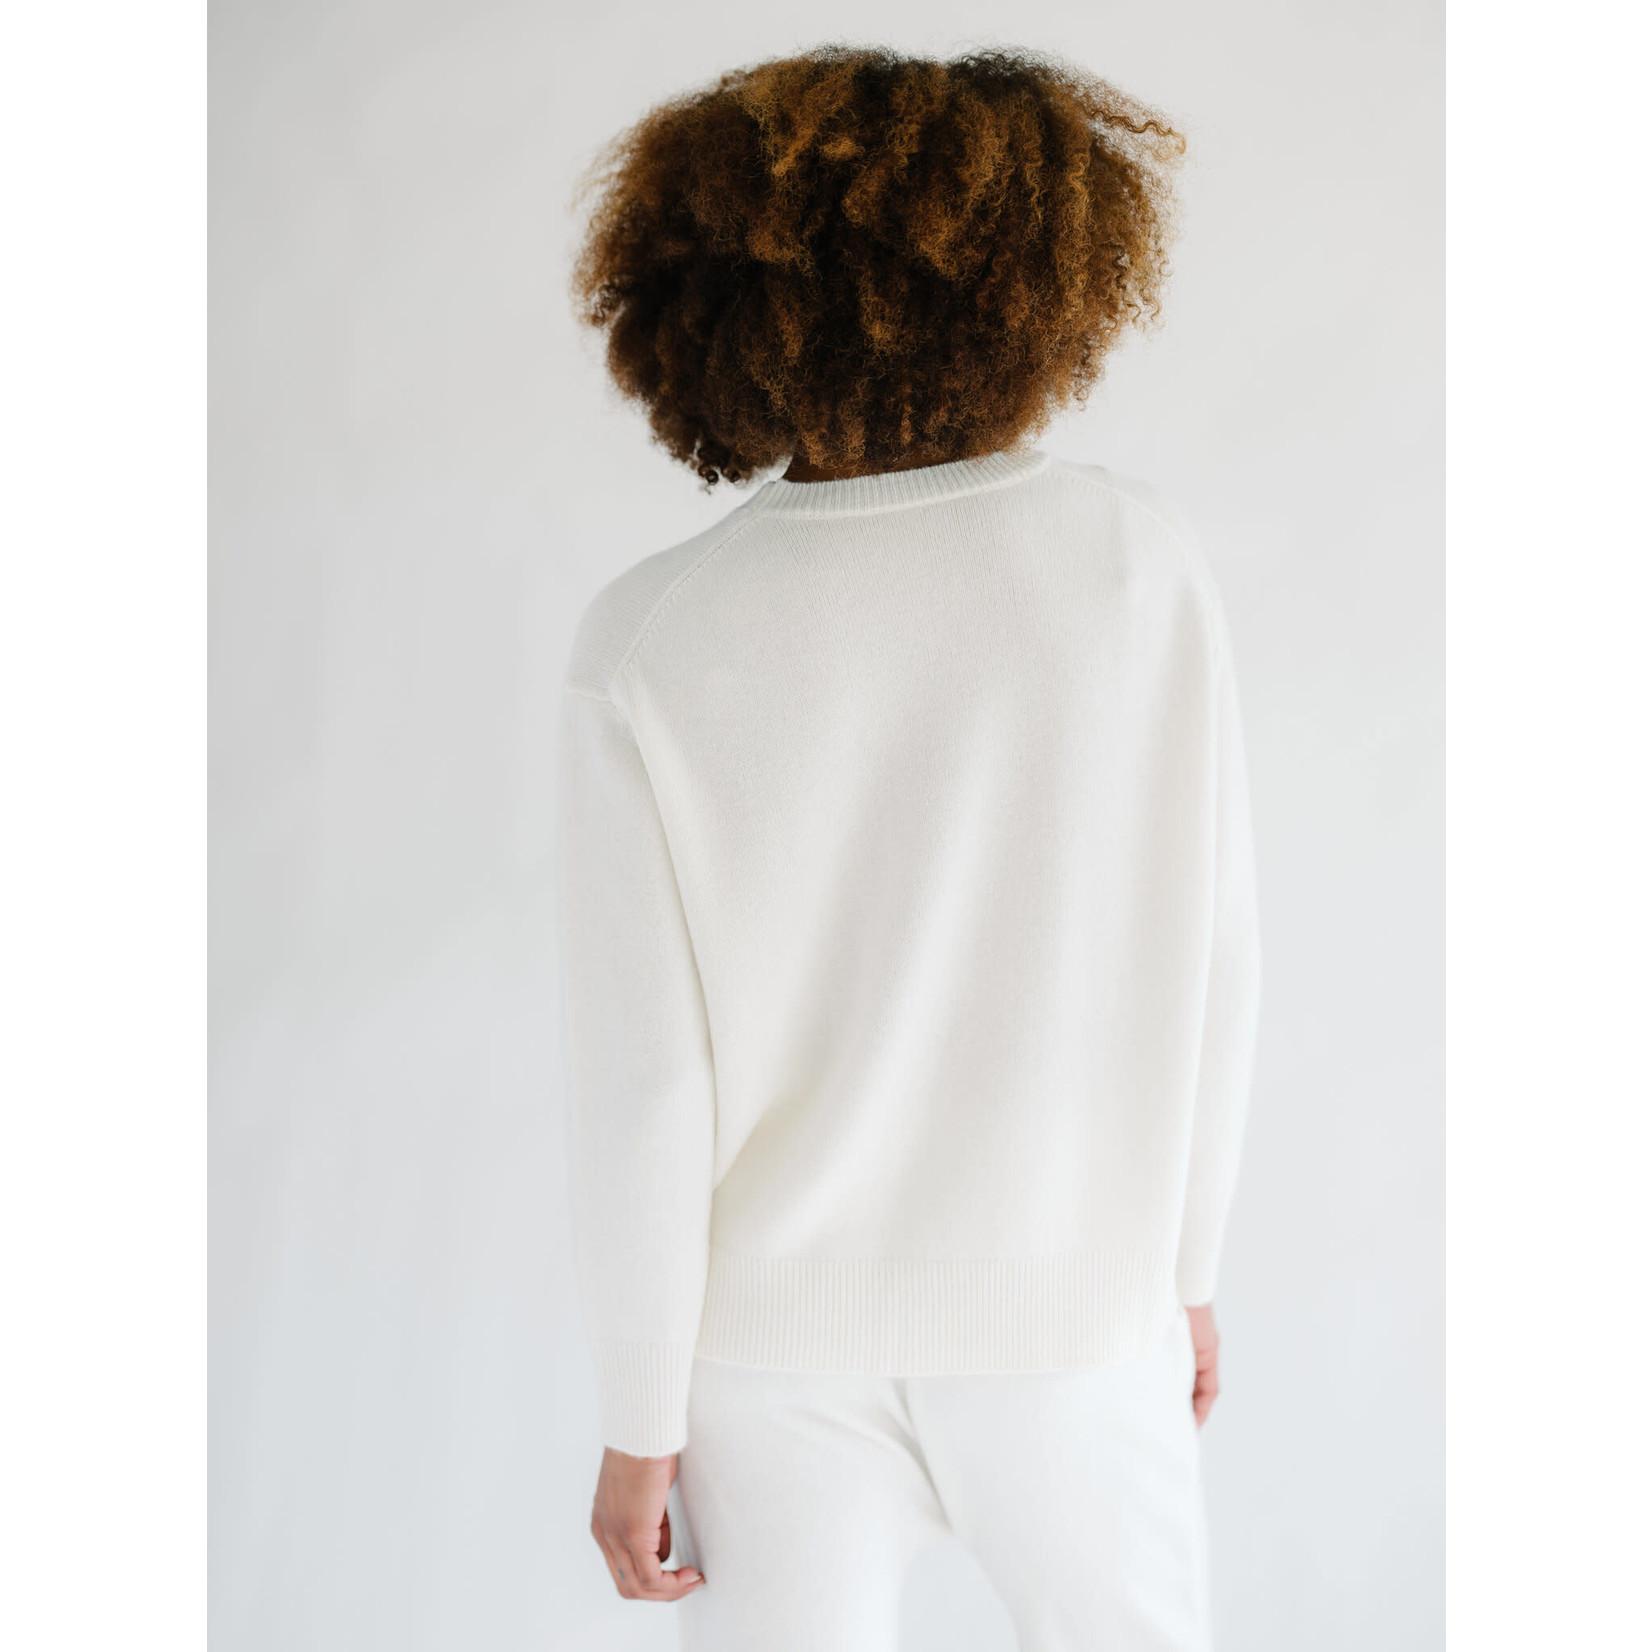 Zenzee Cashmere Ivory Crew Neck Sweater